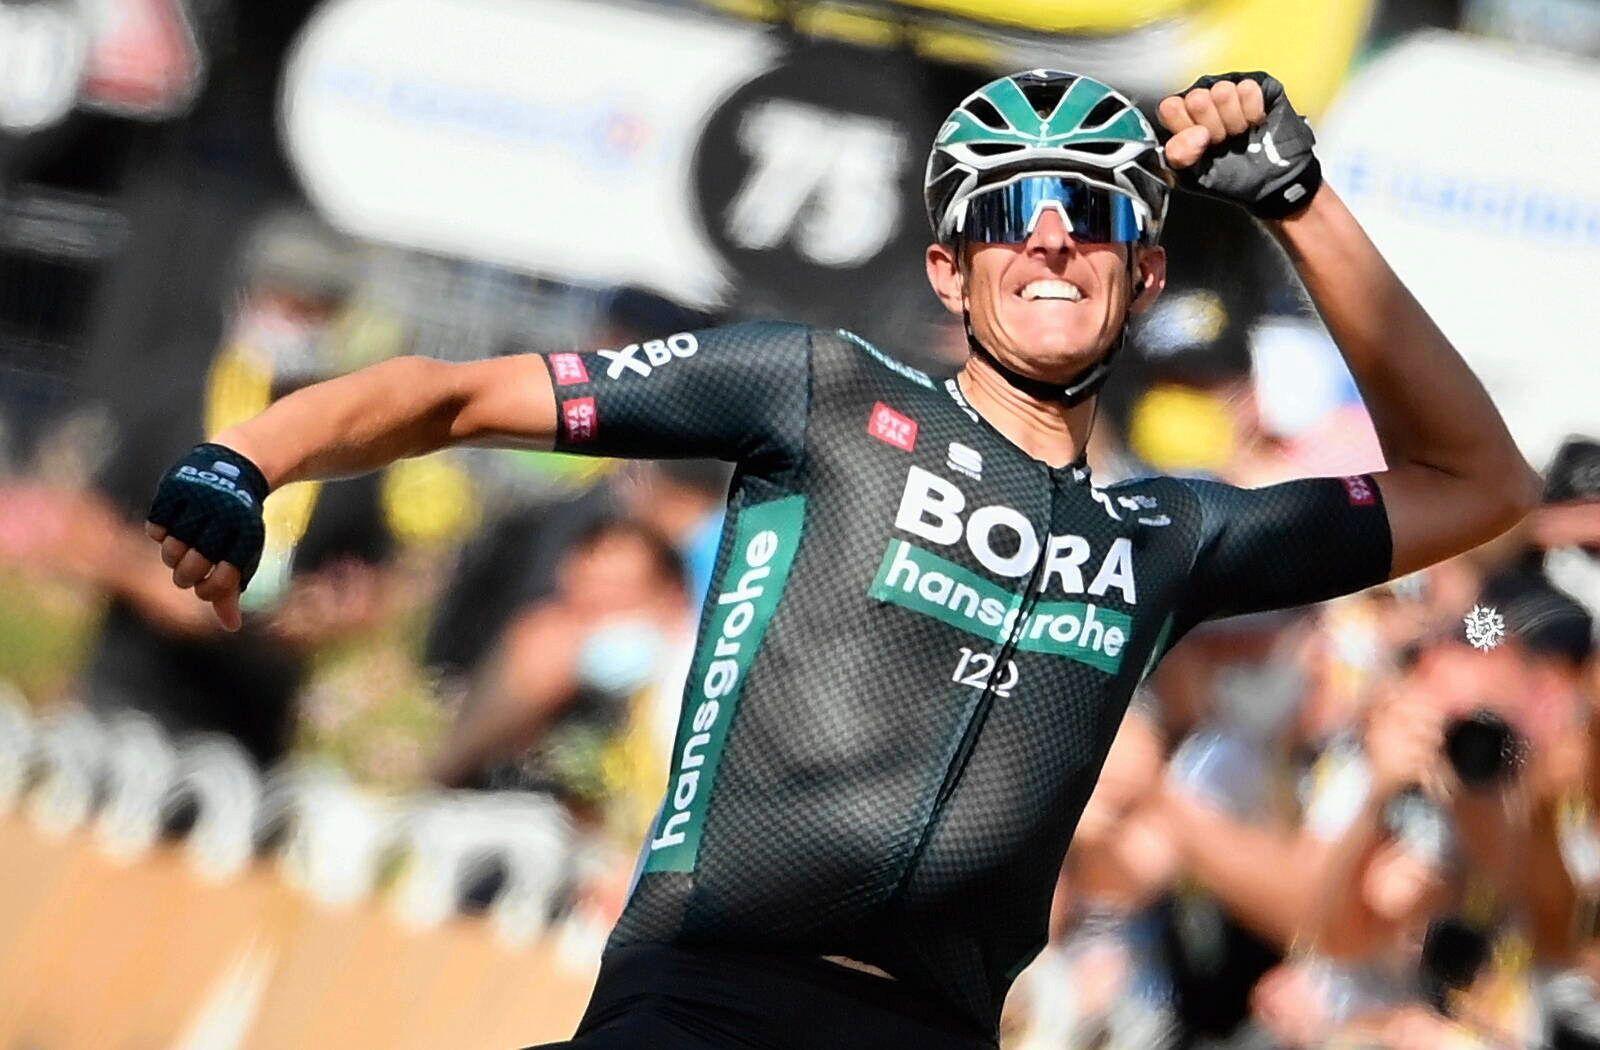 Sport Themen der Woche KW27 Sport Bilder des Tages German Nils Politt of Bora-Hansgrohe celebrates as he crosses the fin